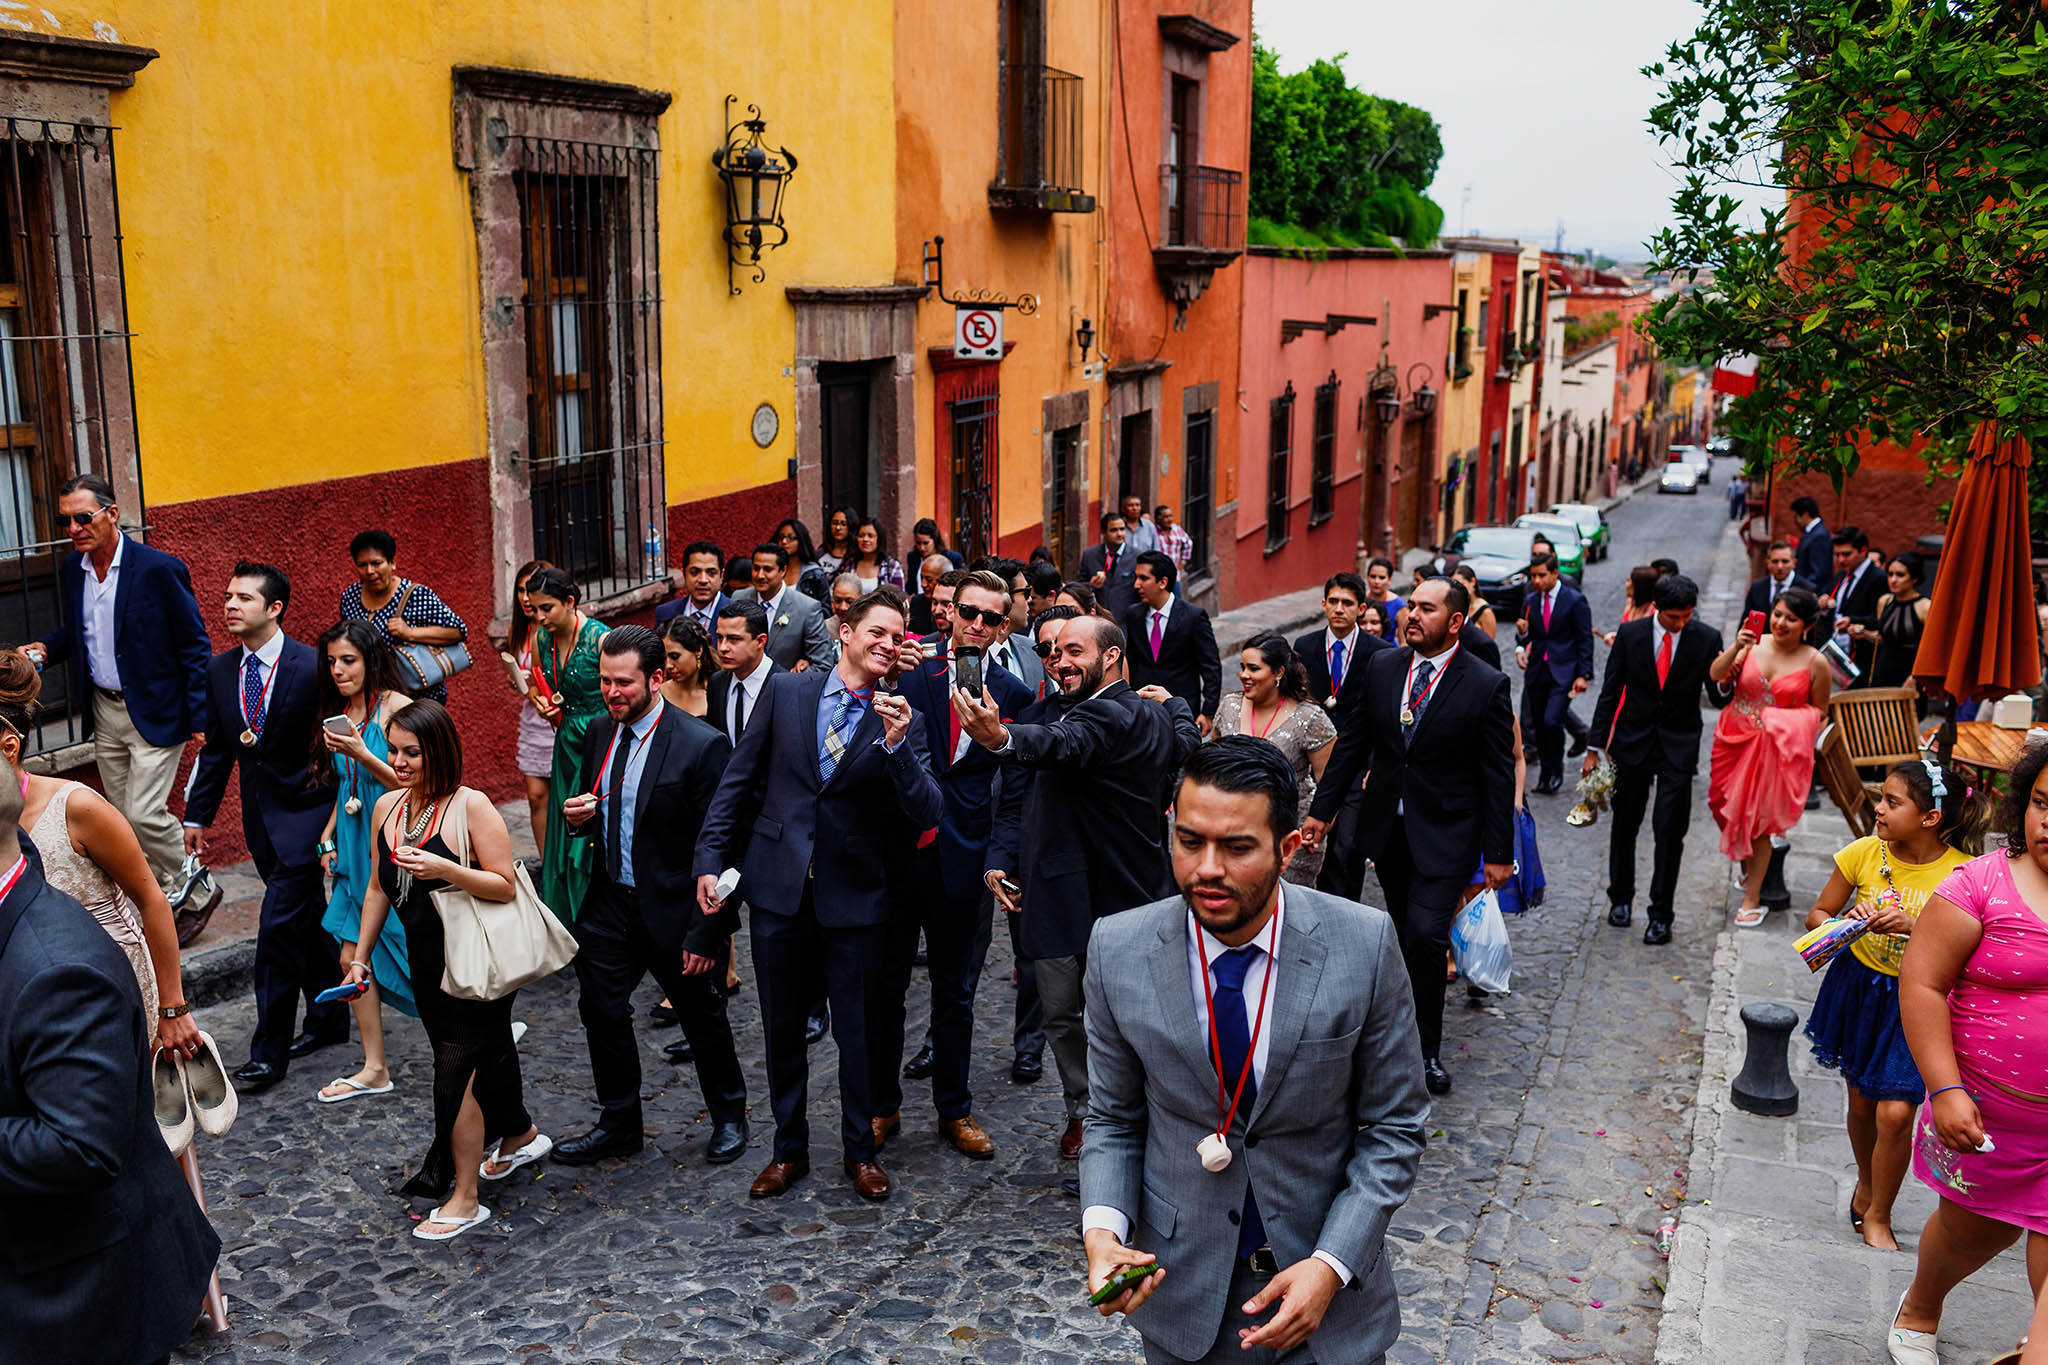 San Miguel de Allende Calllejoneadas